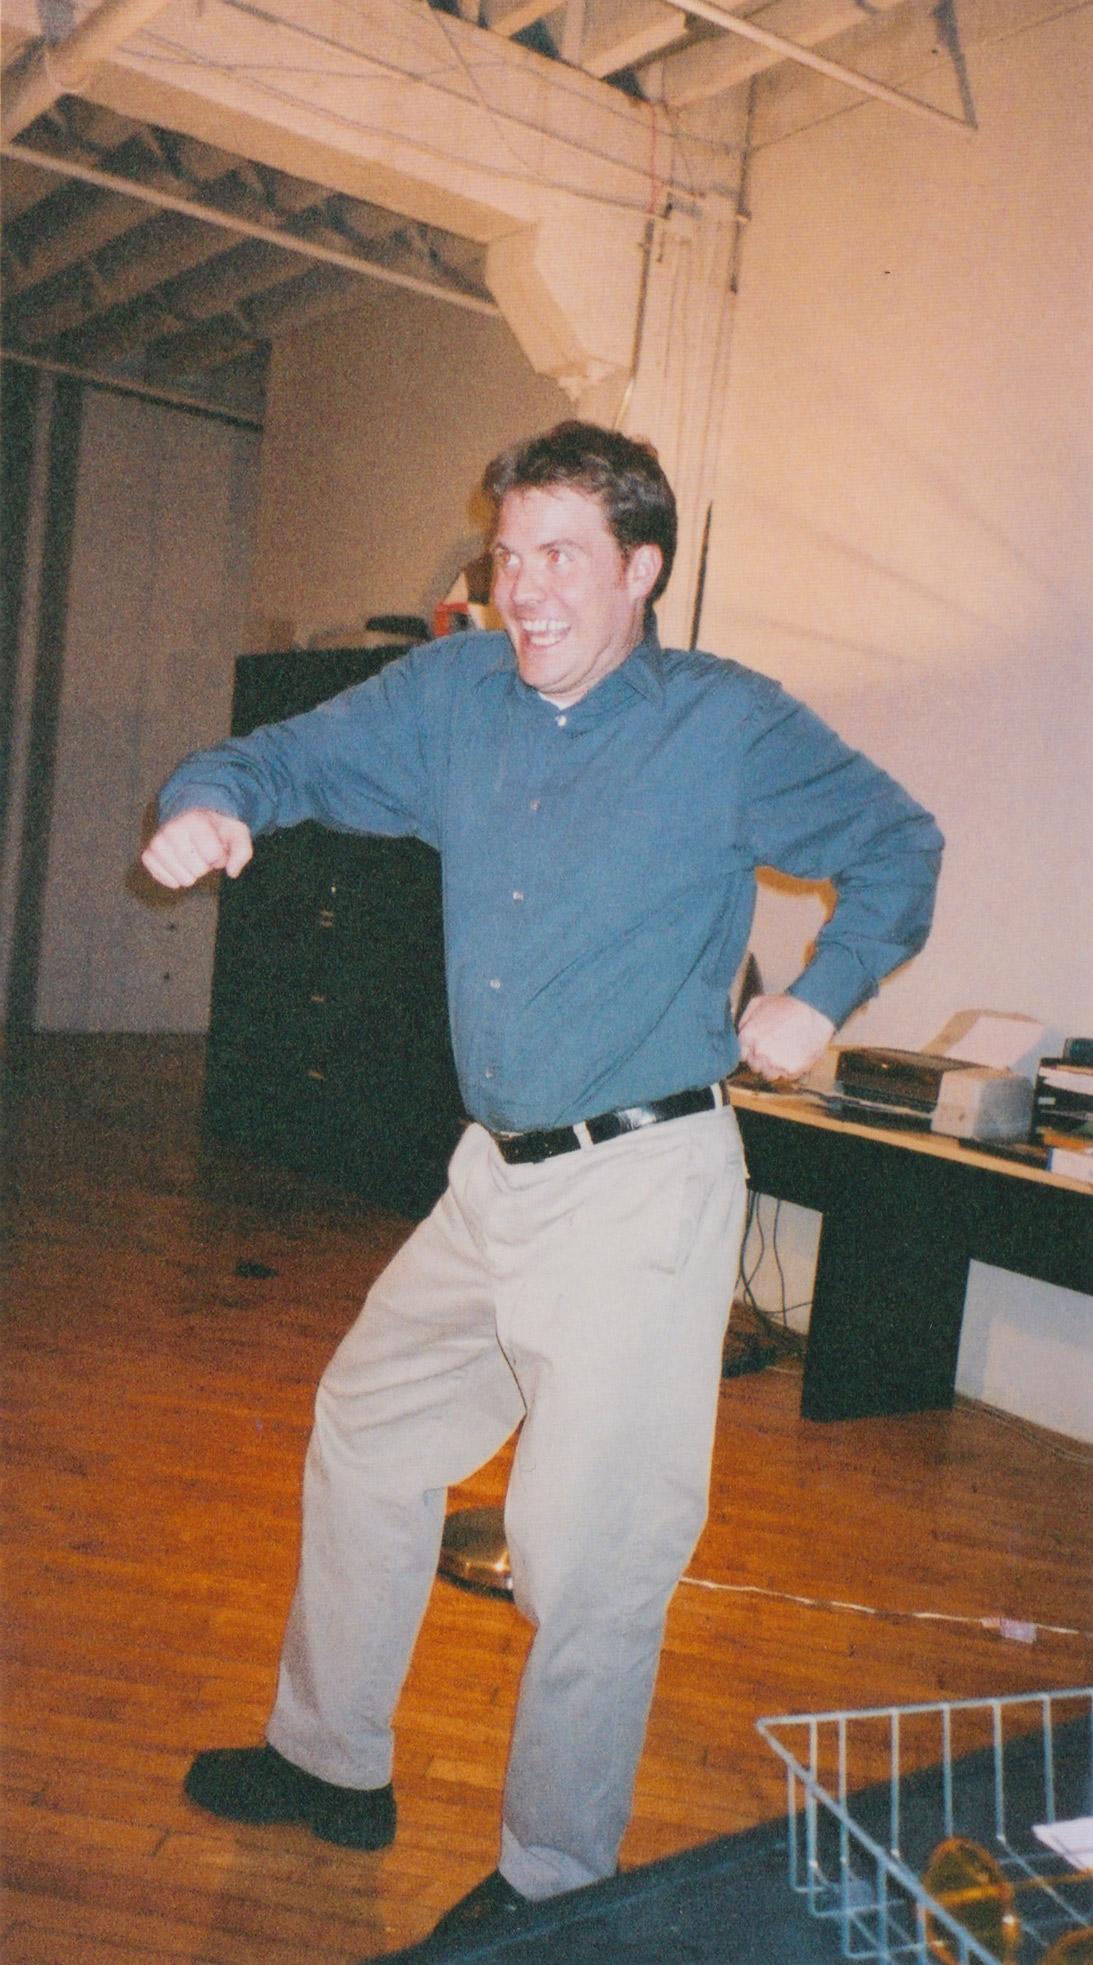 A man in slacks dances